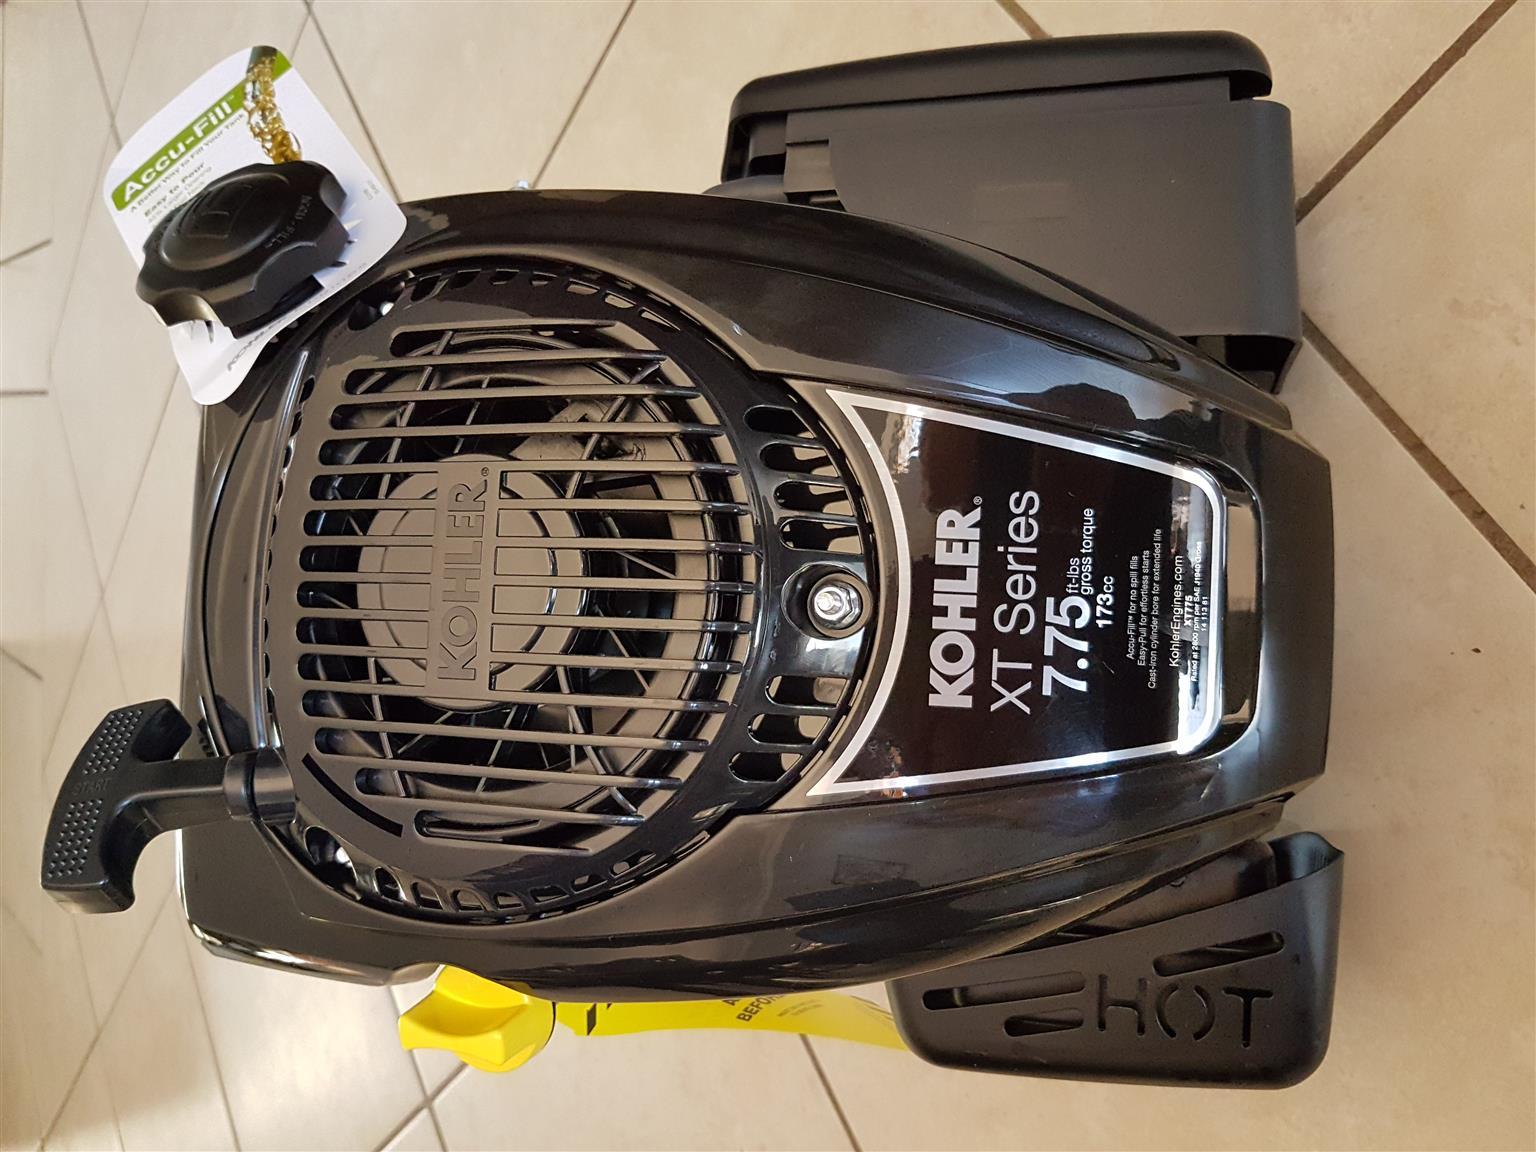 Kohler lawnmower engine. 173 cc 4 stroke